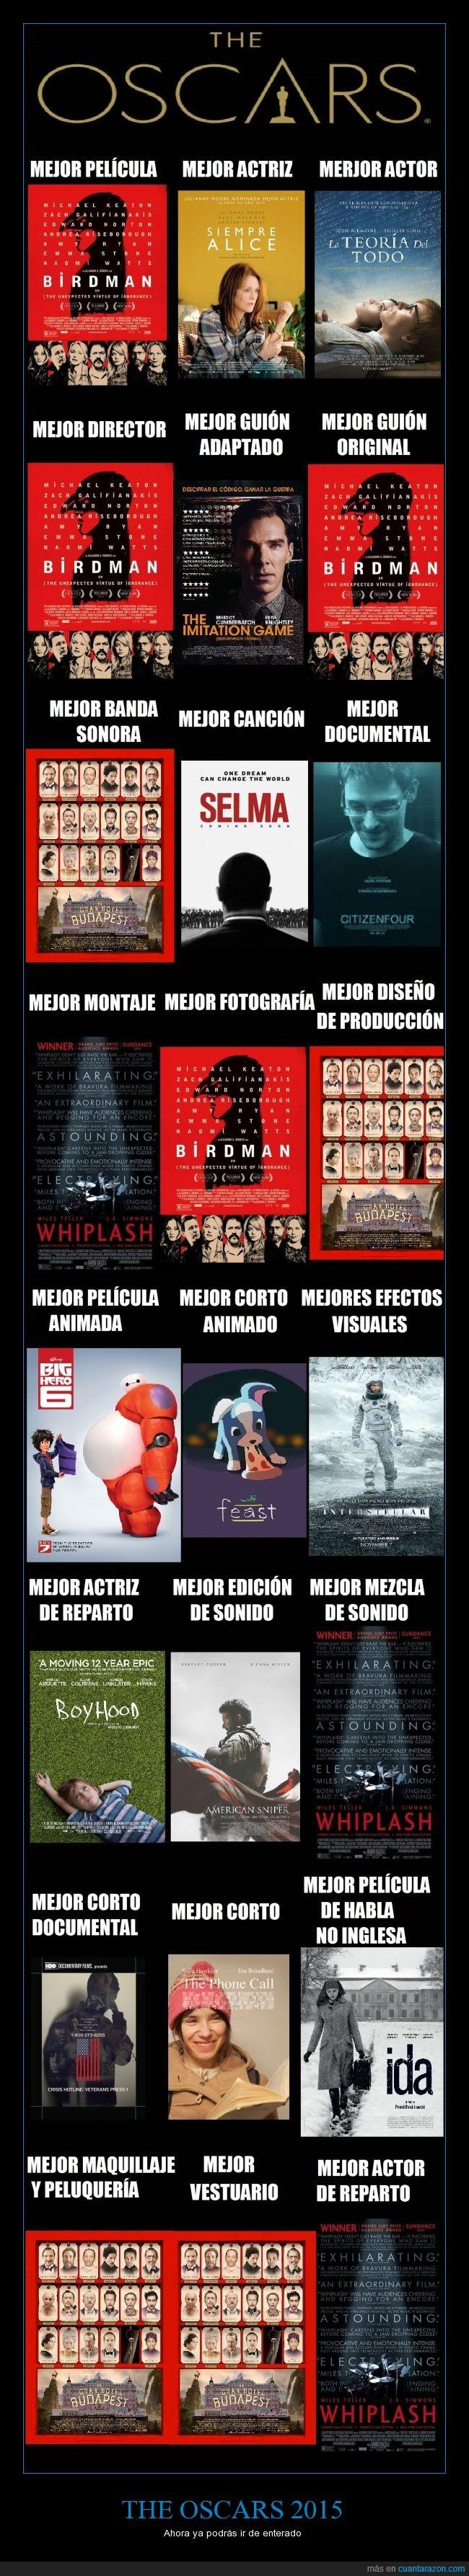 Birdman,El gran hotel Budapest,Mejor montaje de carteles Kinkerash,Neil Patrick Harris,Oscars